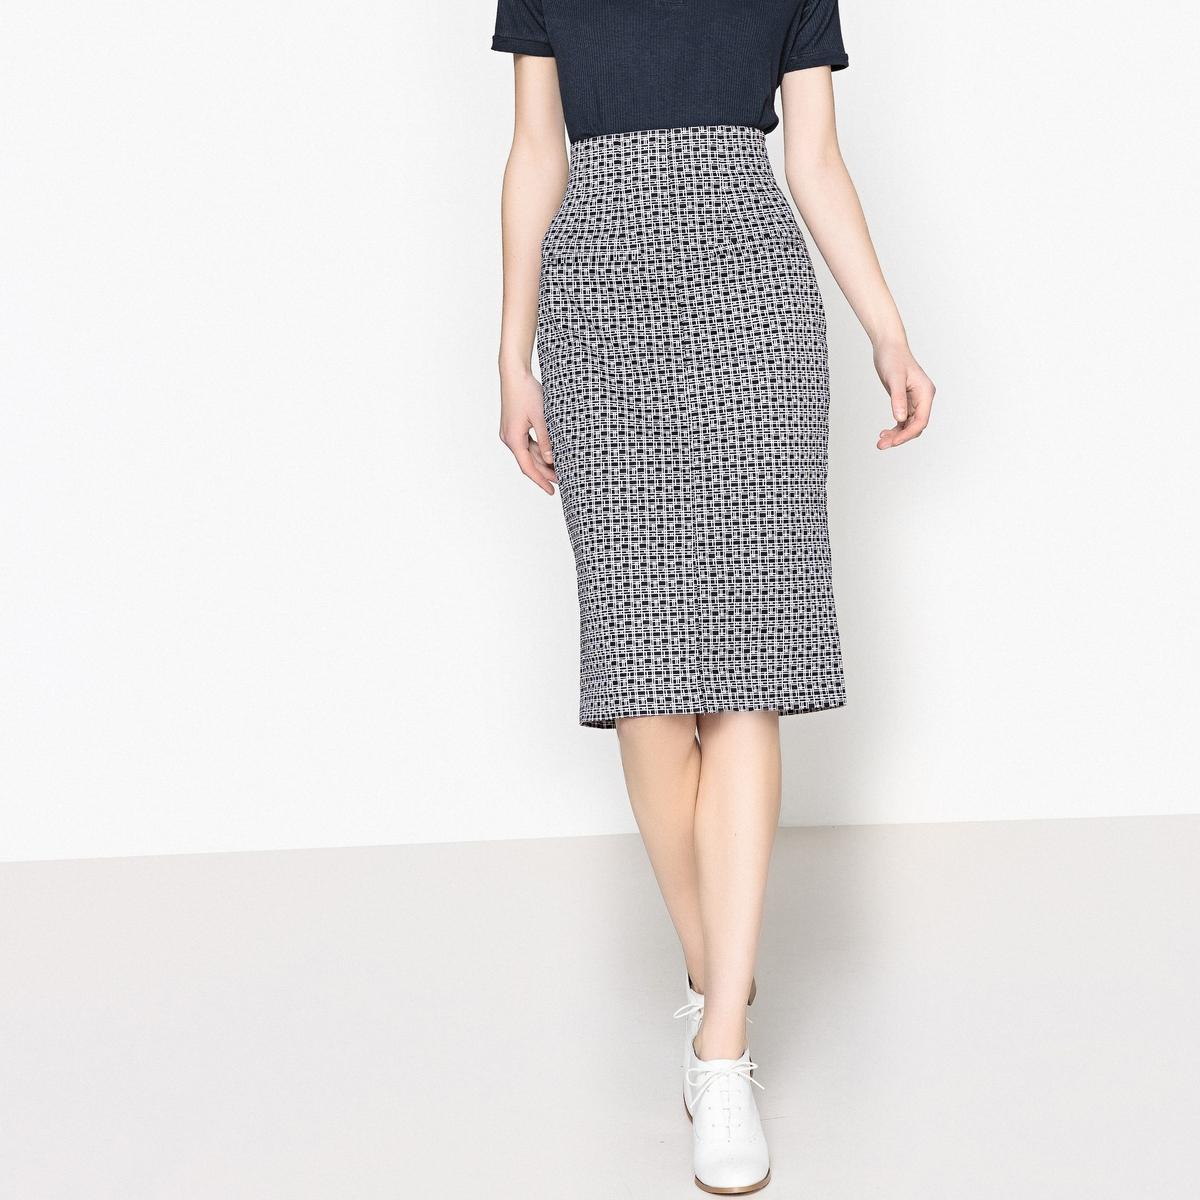 Юбка-карандаш с геометрическим рисунком printio юбка карандаш укороченная